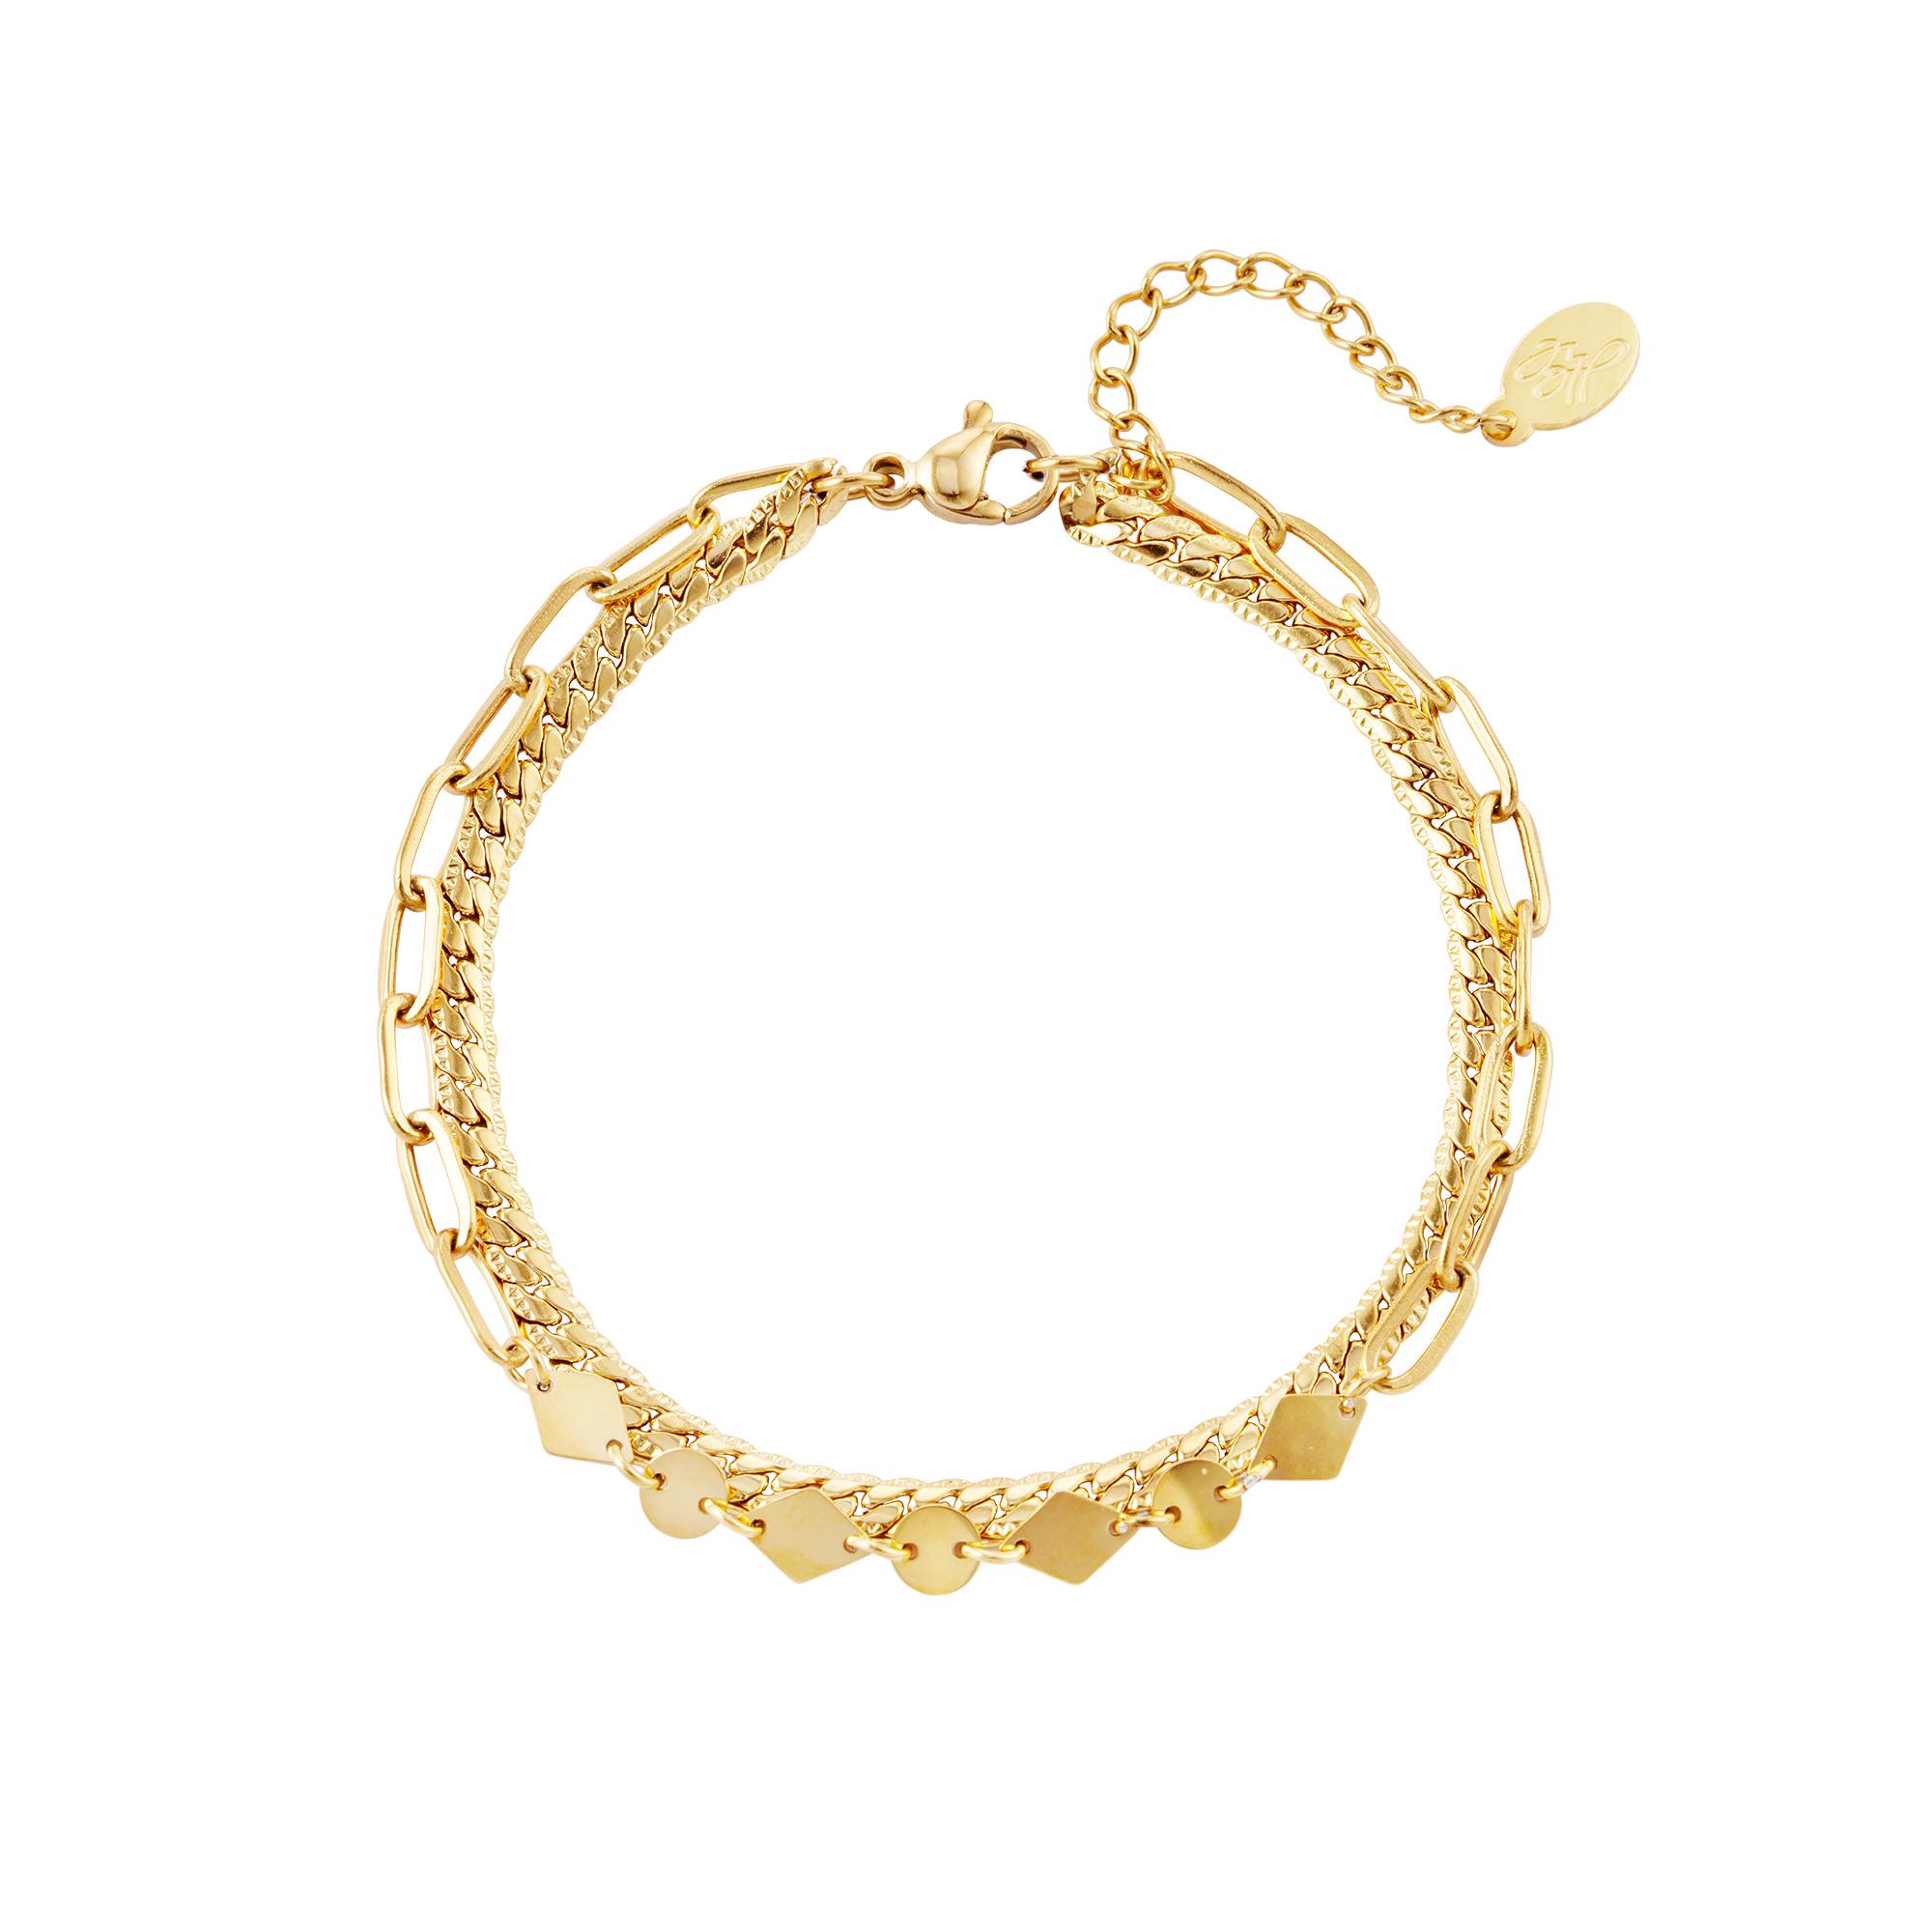 Double layered bracelet